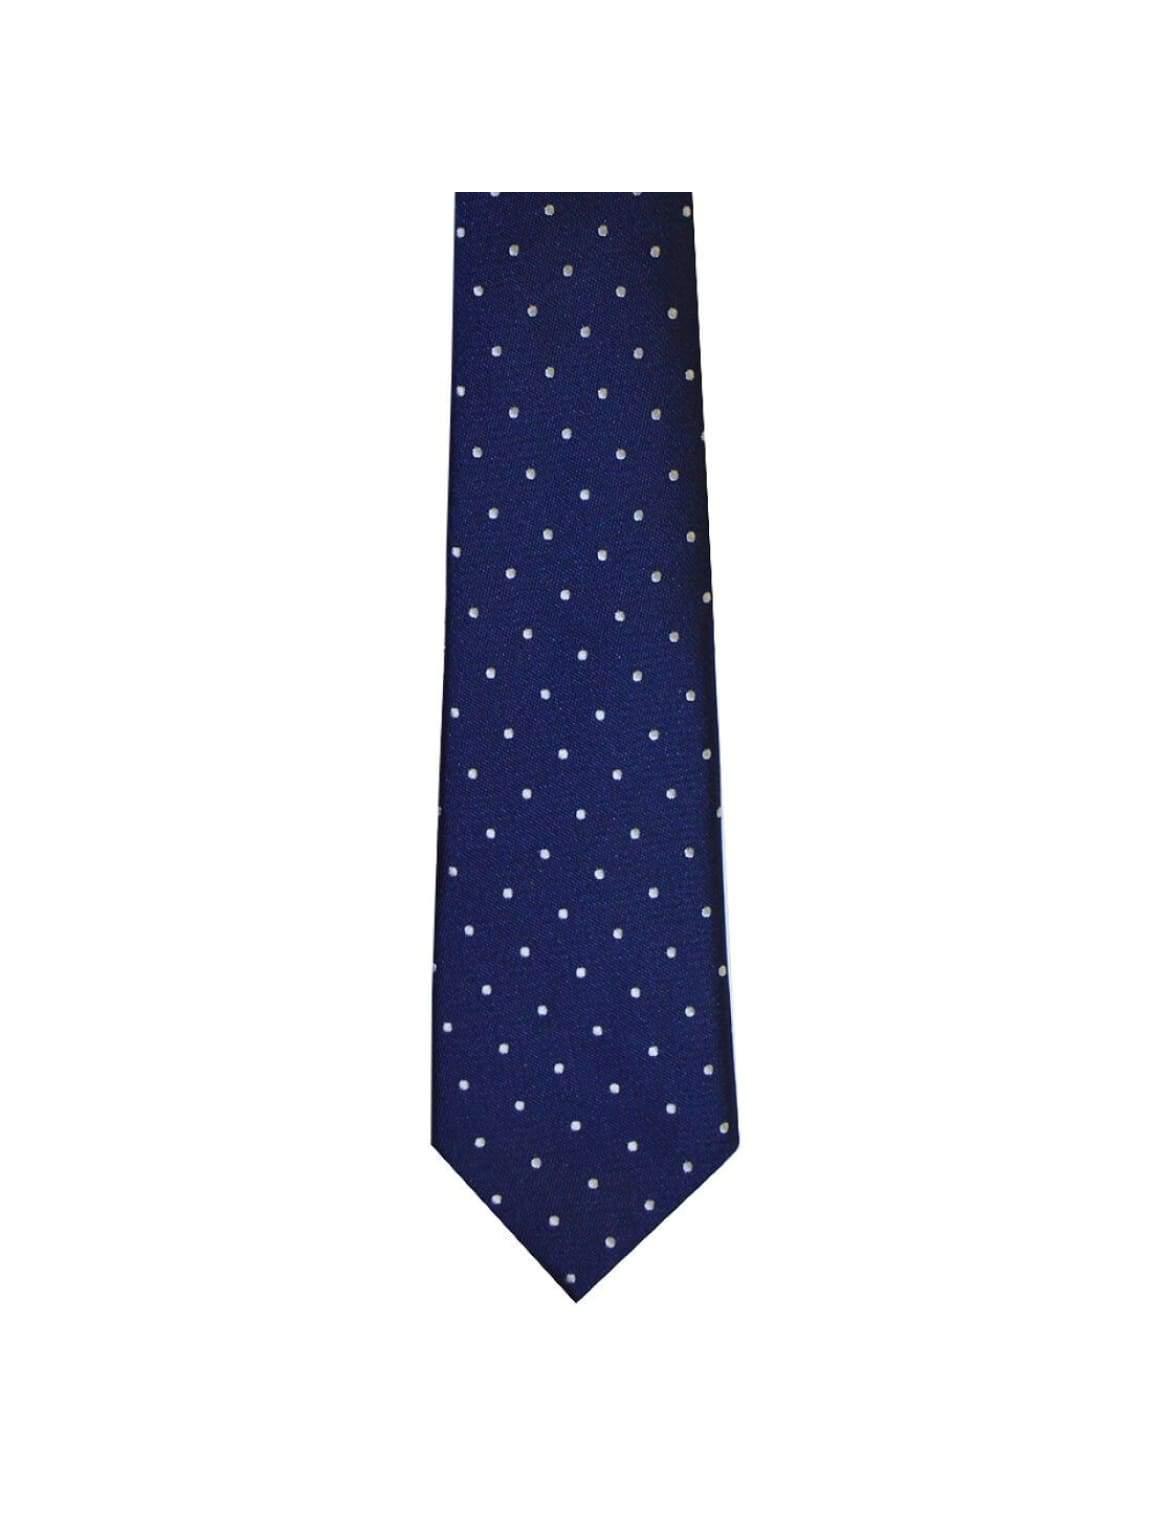 LA Smith Navy And White Skinny Polka Dot Tie - Accessories